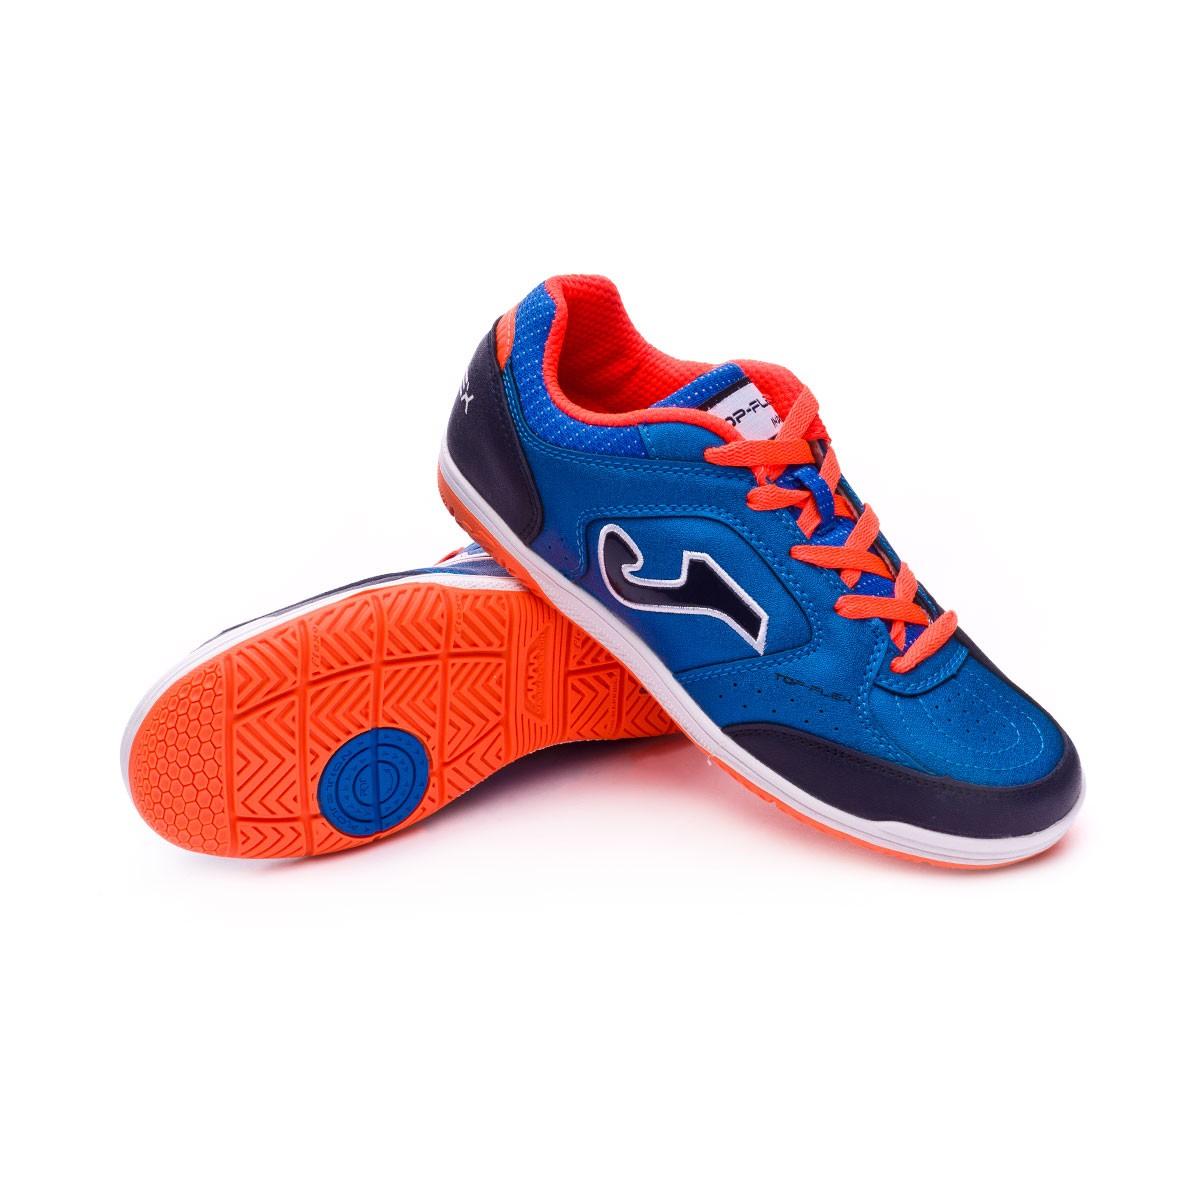 6fb40164c Futsal Boot Joma Top flex Niño Blue-Orange - Soloporteros is now ...